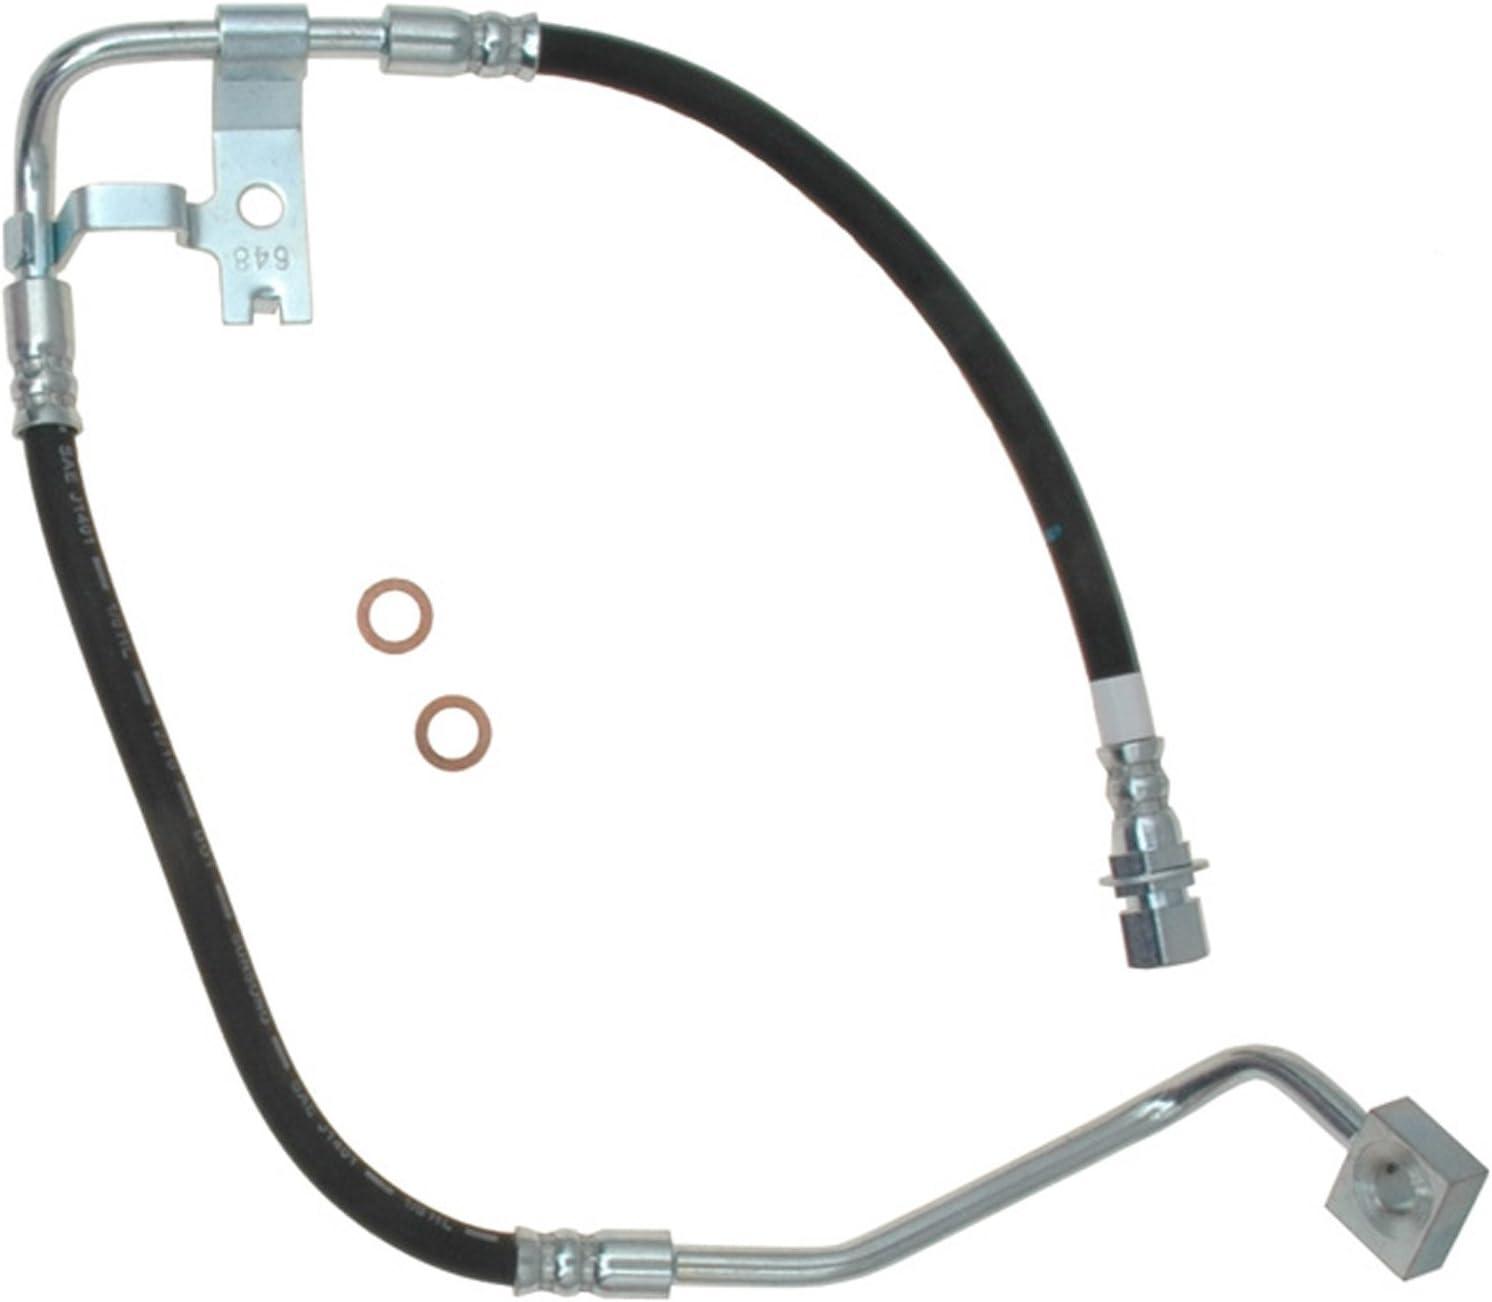 BossBearing Rear Hand Park Brake Cable for Honda TRX450ES Foreman 4x4 ES 1998 1999 2000 2001